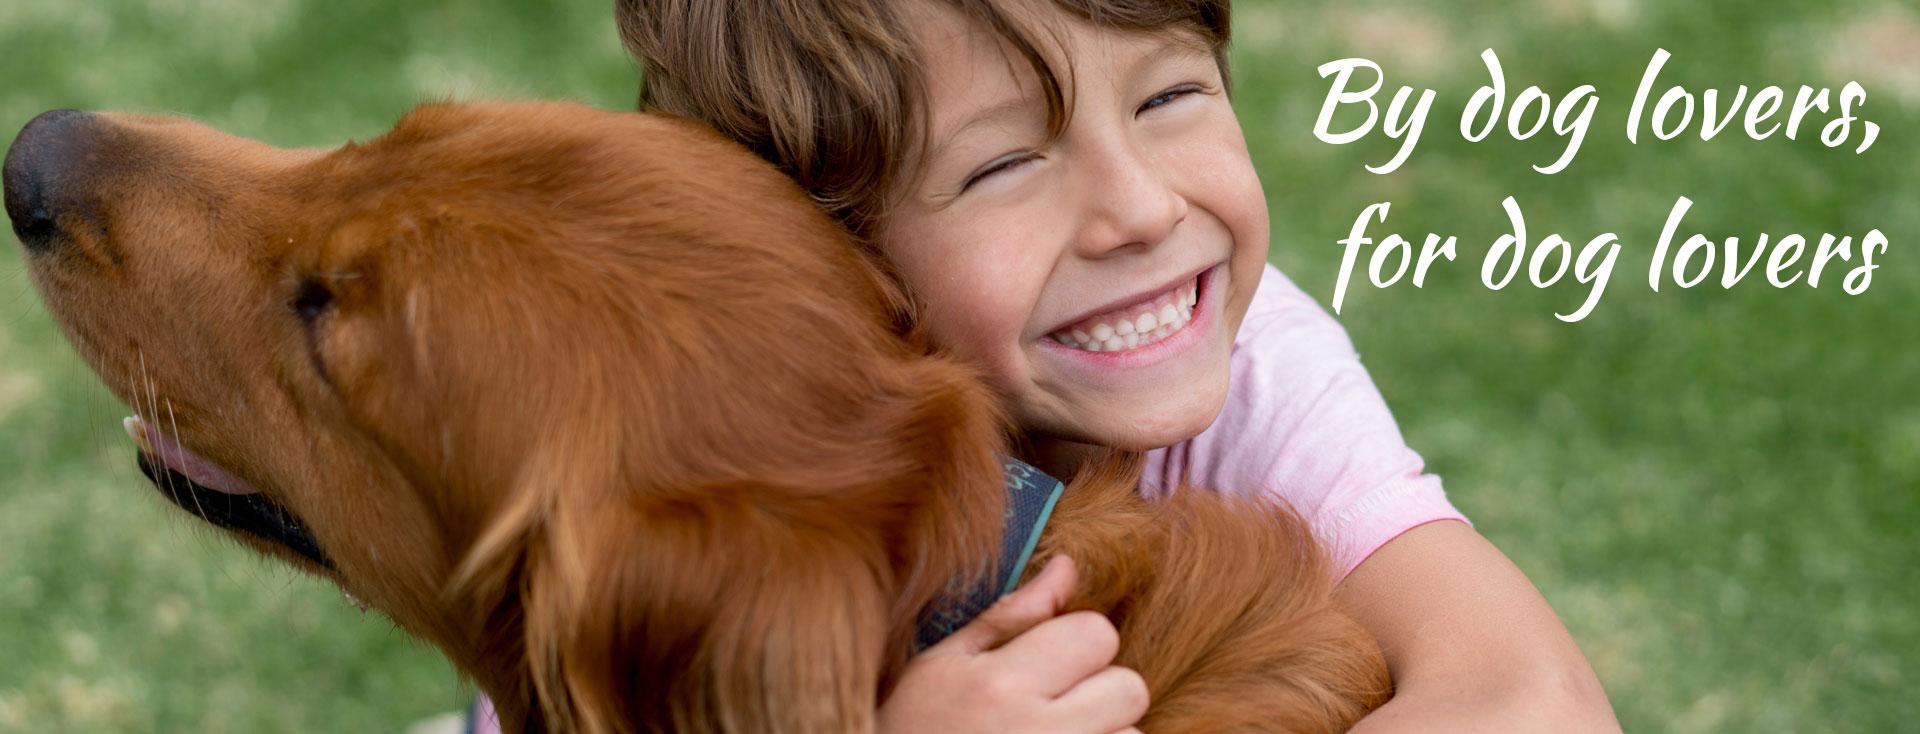 Organic diy dog wash brunswick dooba diy dog wash dooba dog wash melbourne diy dog wash melbourne pet wash brunswick solutioingenieria Choice Image